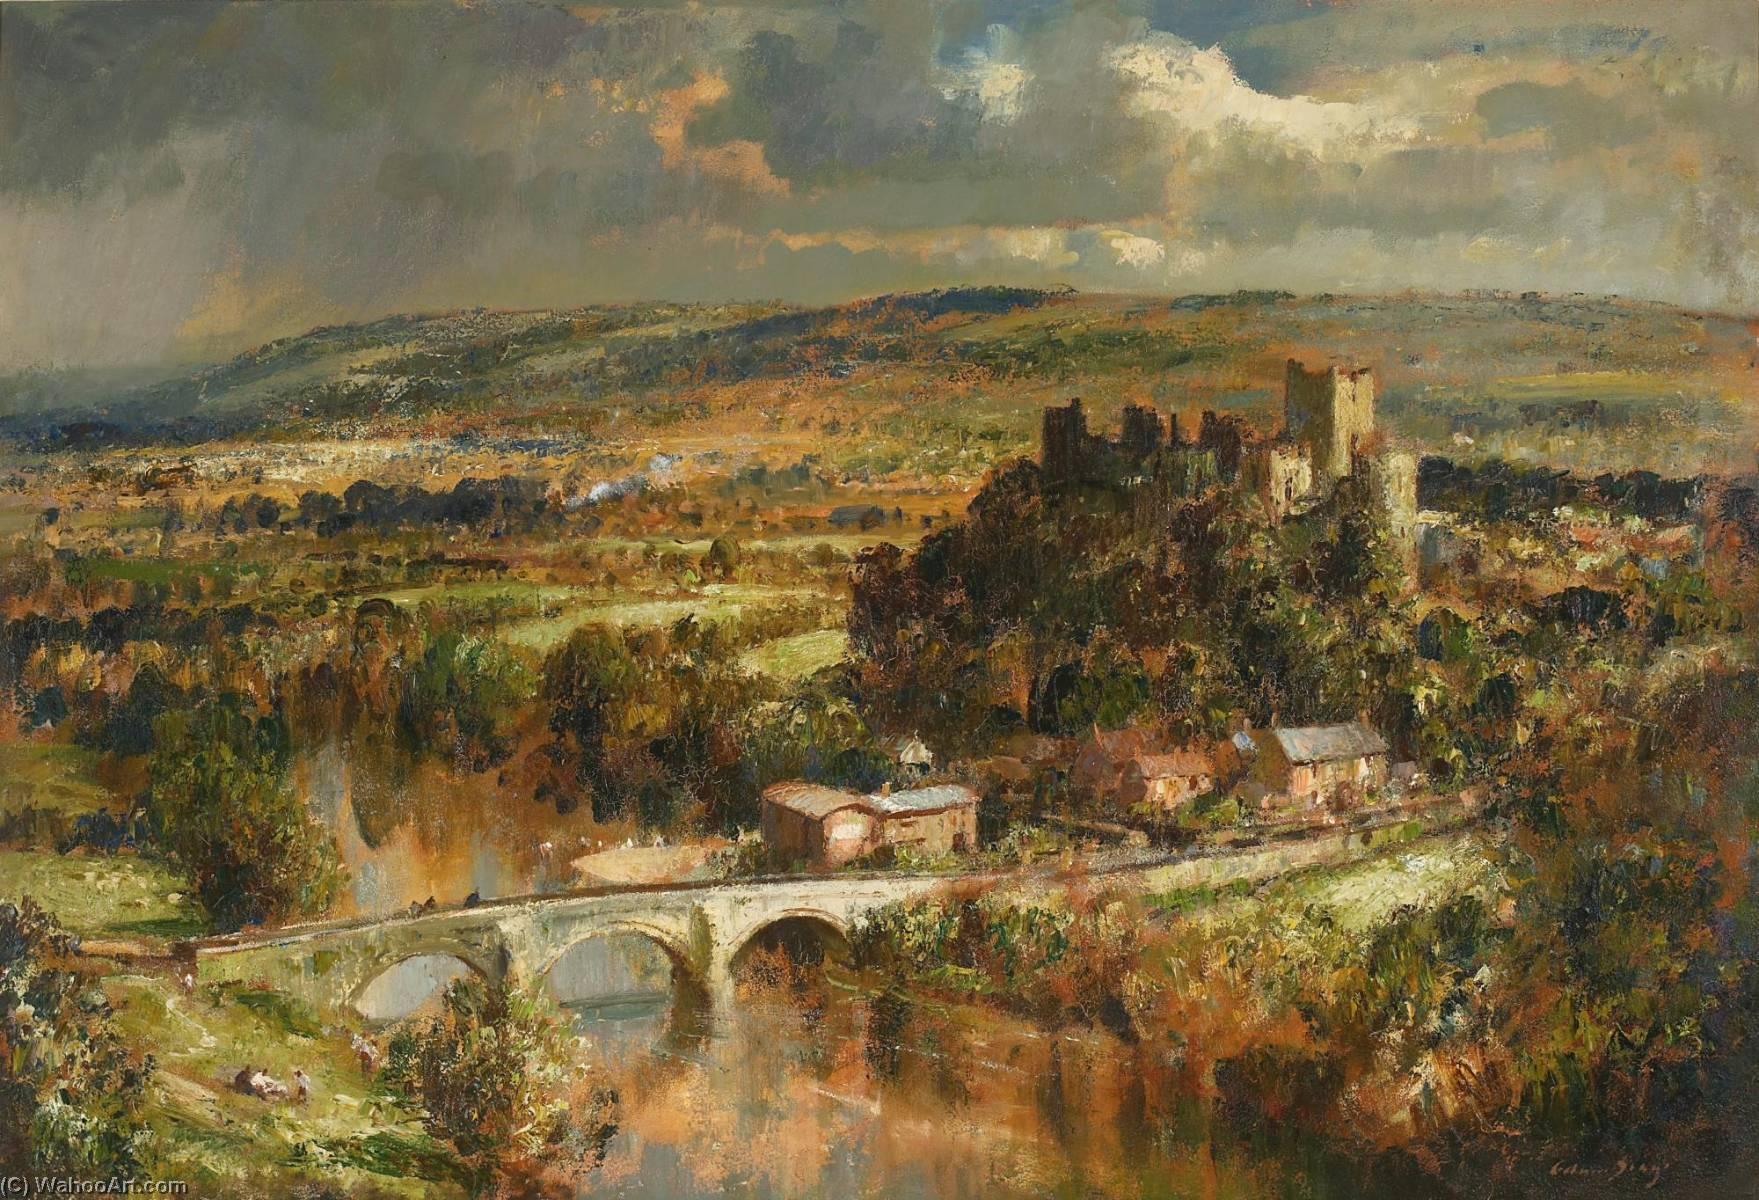 Vue d Ludlow Château de Edward Seago   Reproductions D'œuvres D'art Edward Seago   WahooArt.com